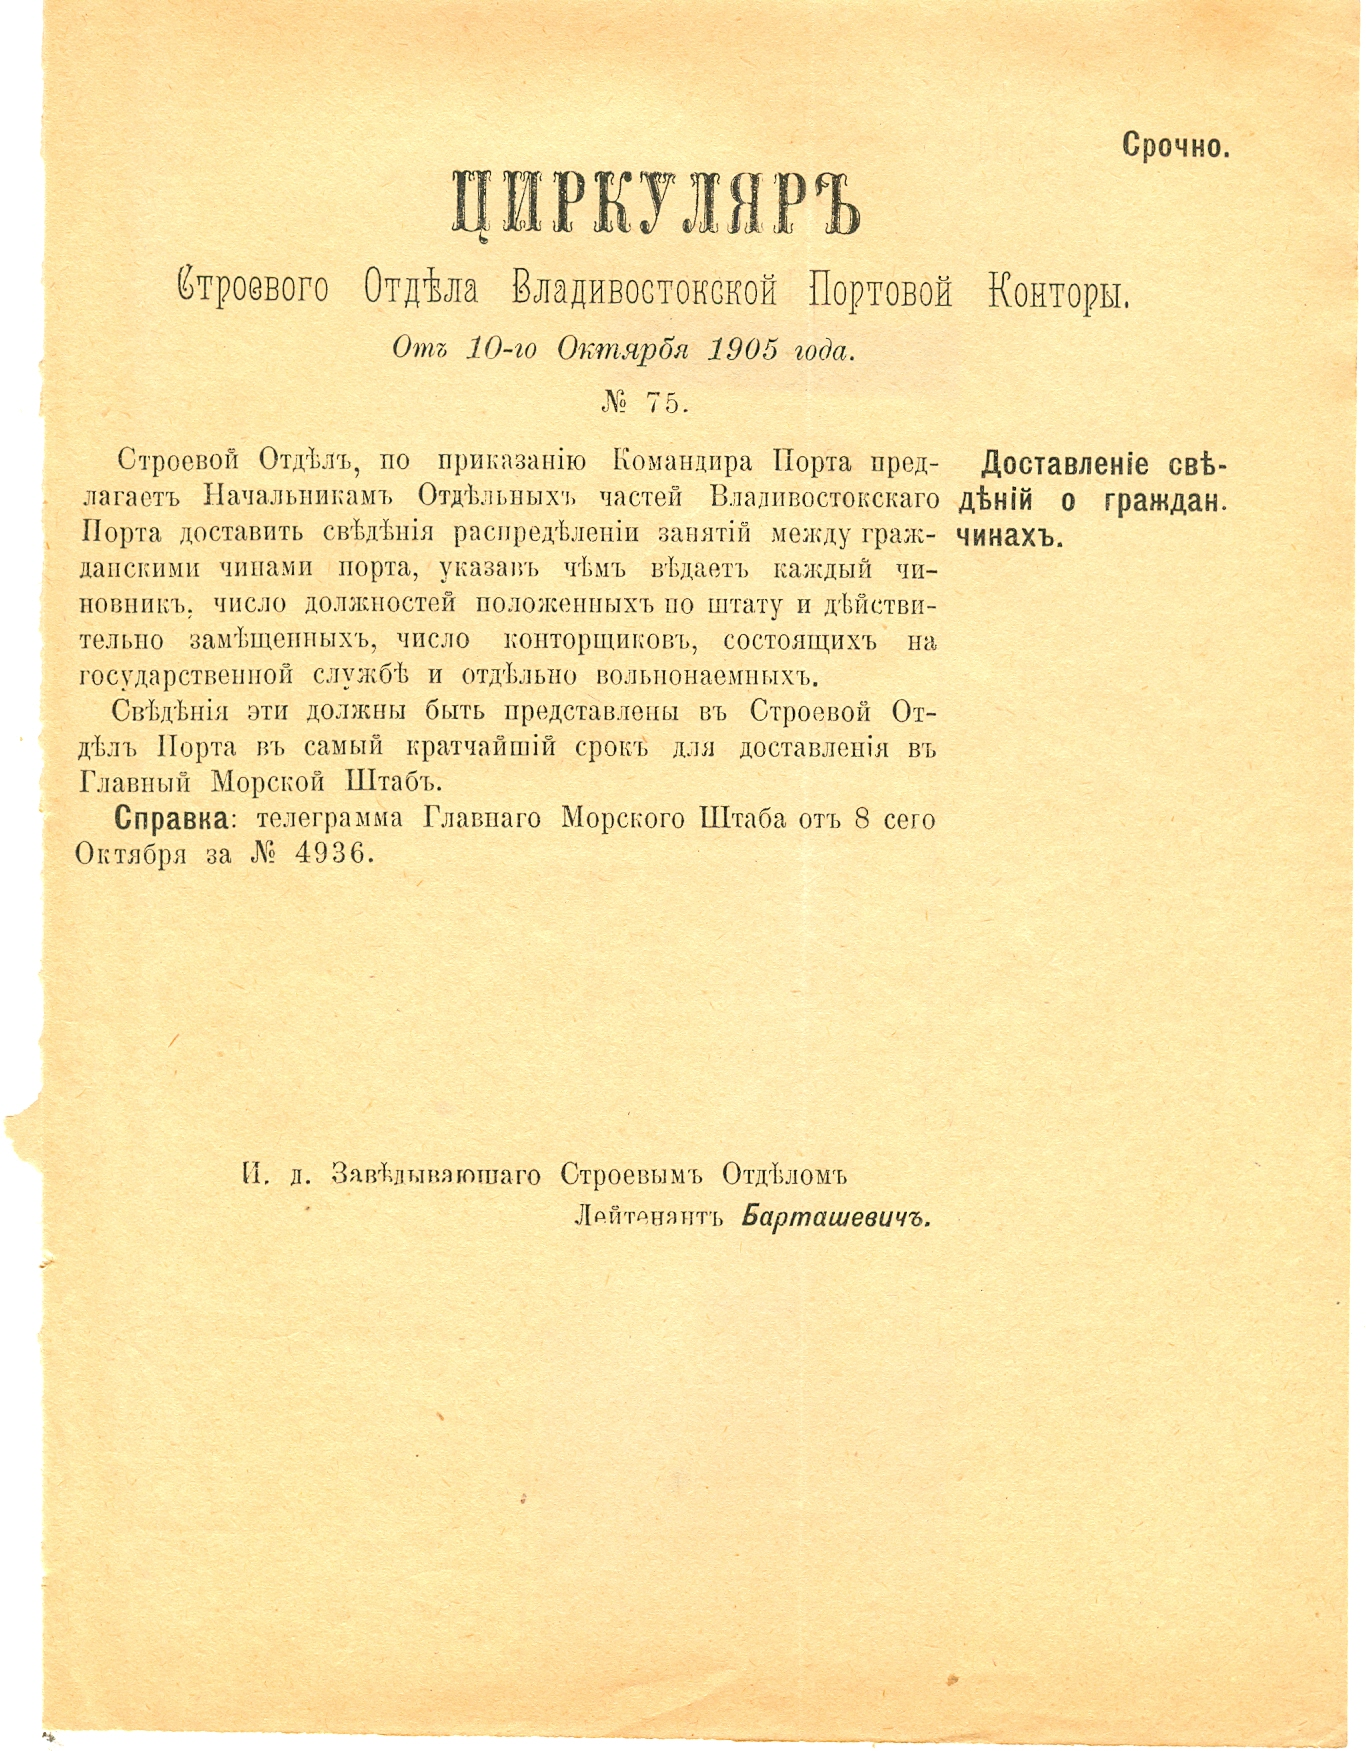 От 10-го Октября 1905 года.